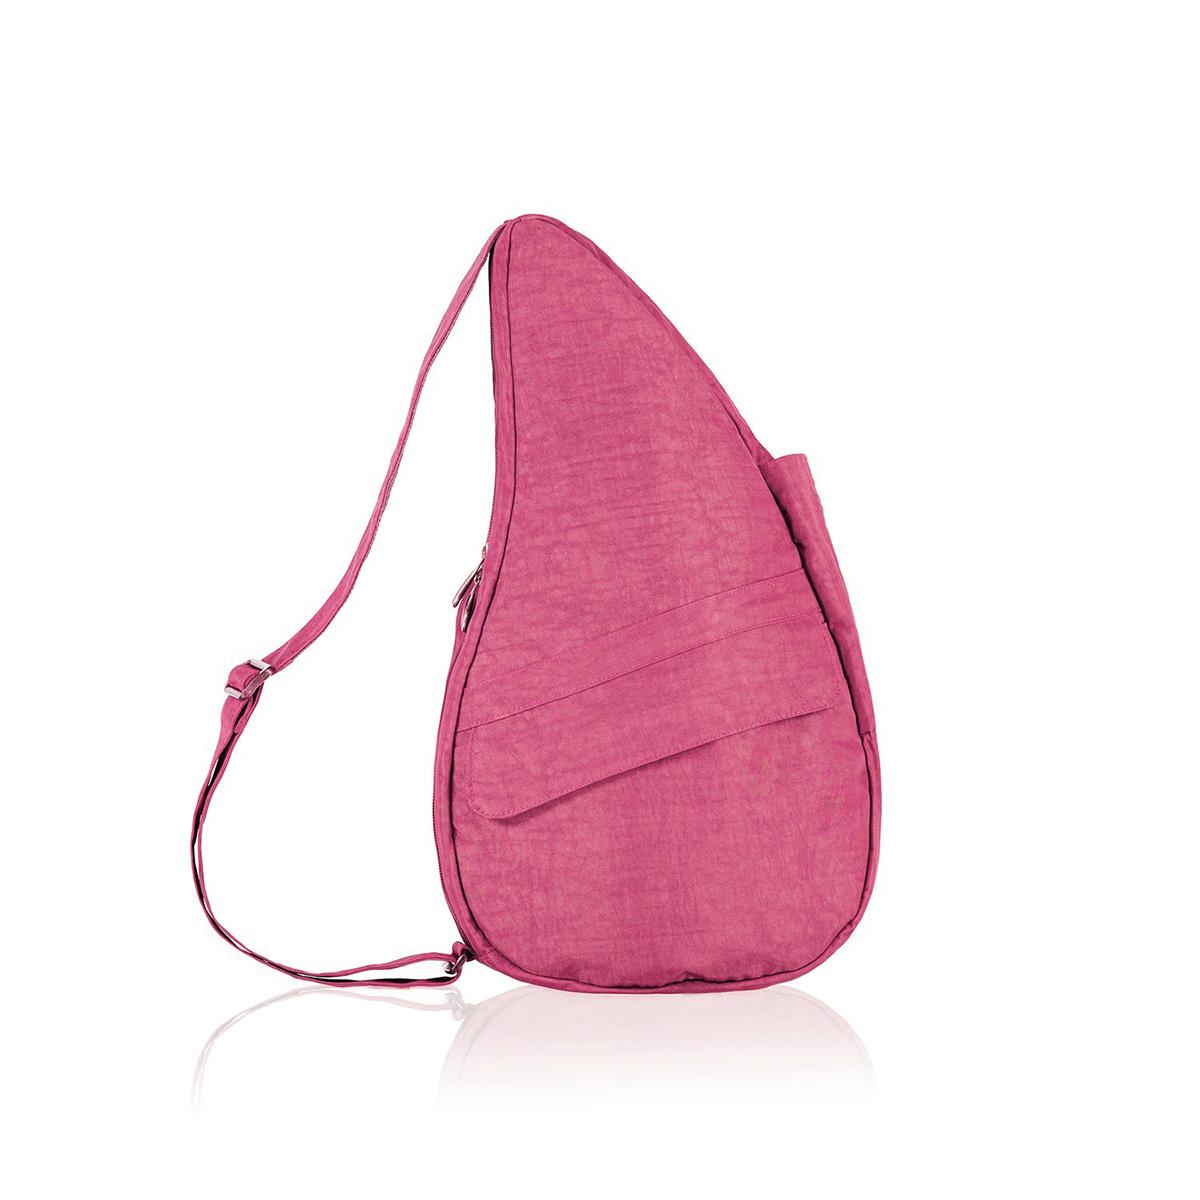 Healthy Back Bag/ヘルシーバックバッグ/ショルダーバッグ/ボディバッグ/旅行バッグ/軽量/レディース/メンズ 《限定ポーチ付》 公式ストア ヘルシーバックバッグ テクスチャードナイロン Mサイズ クランベリー